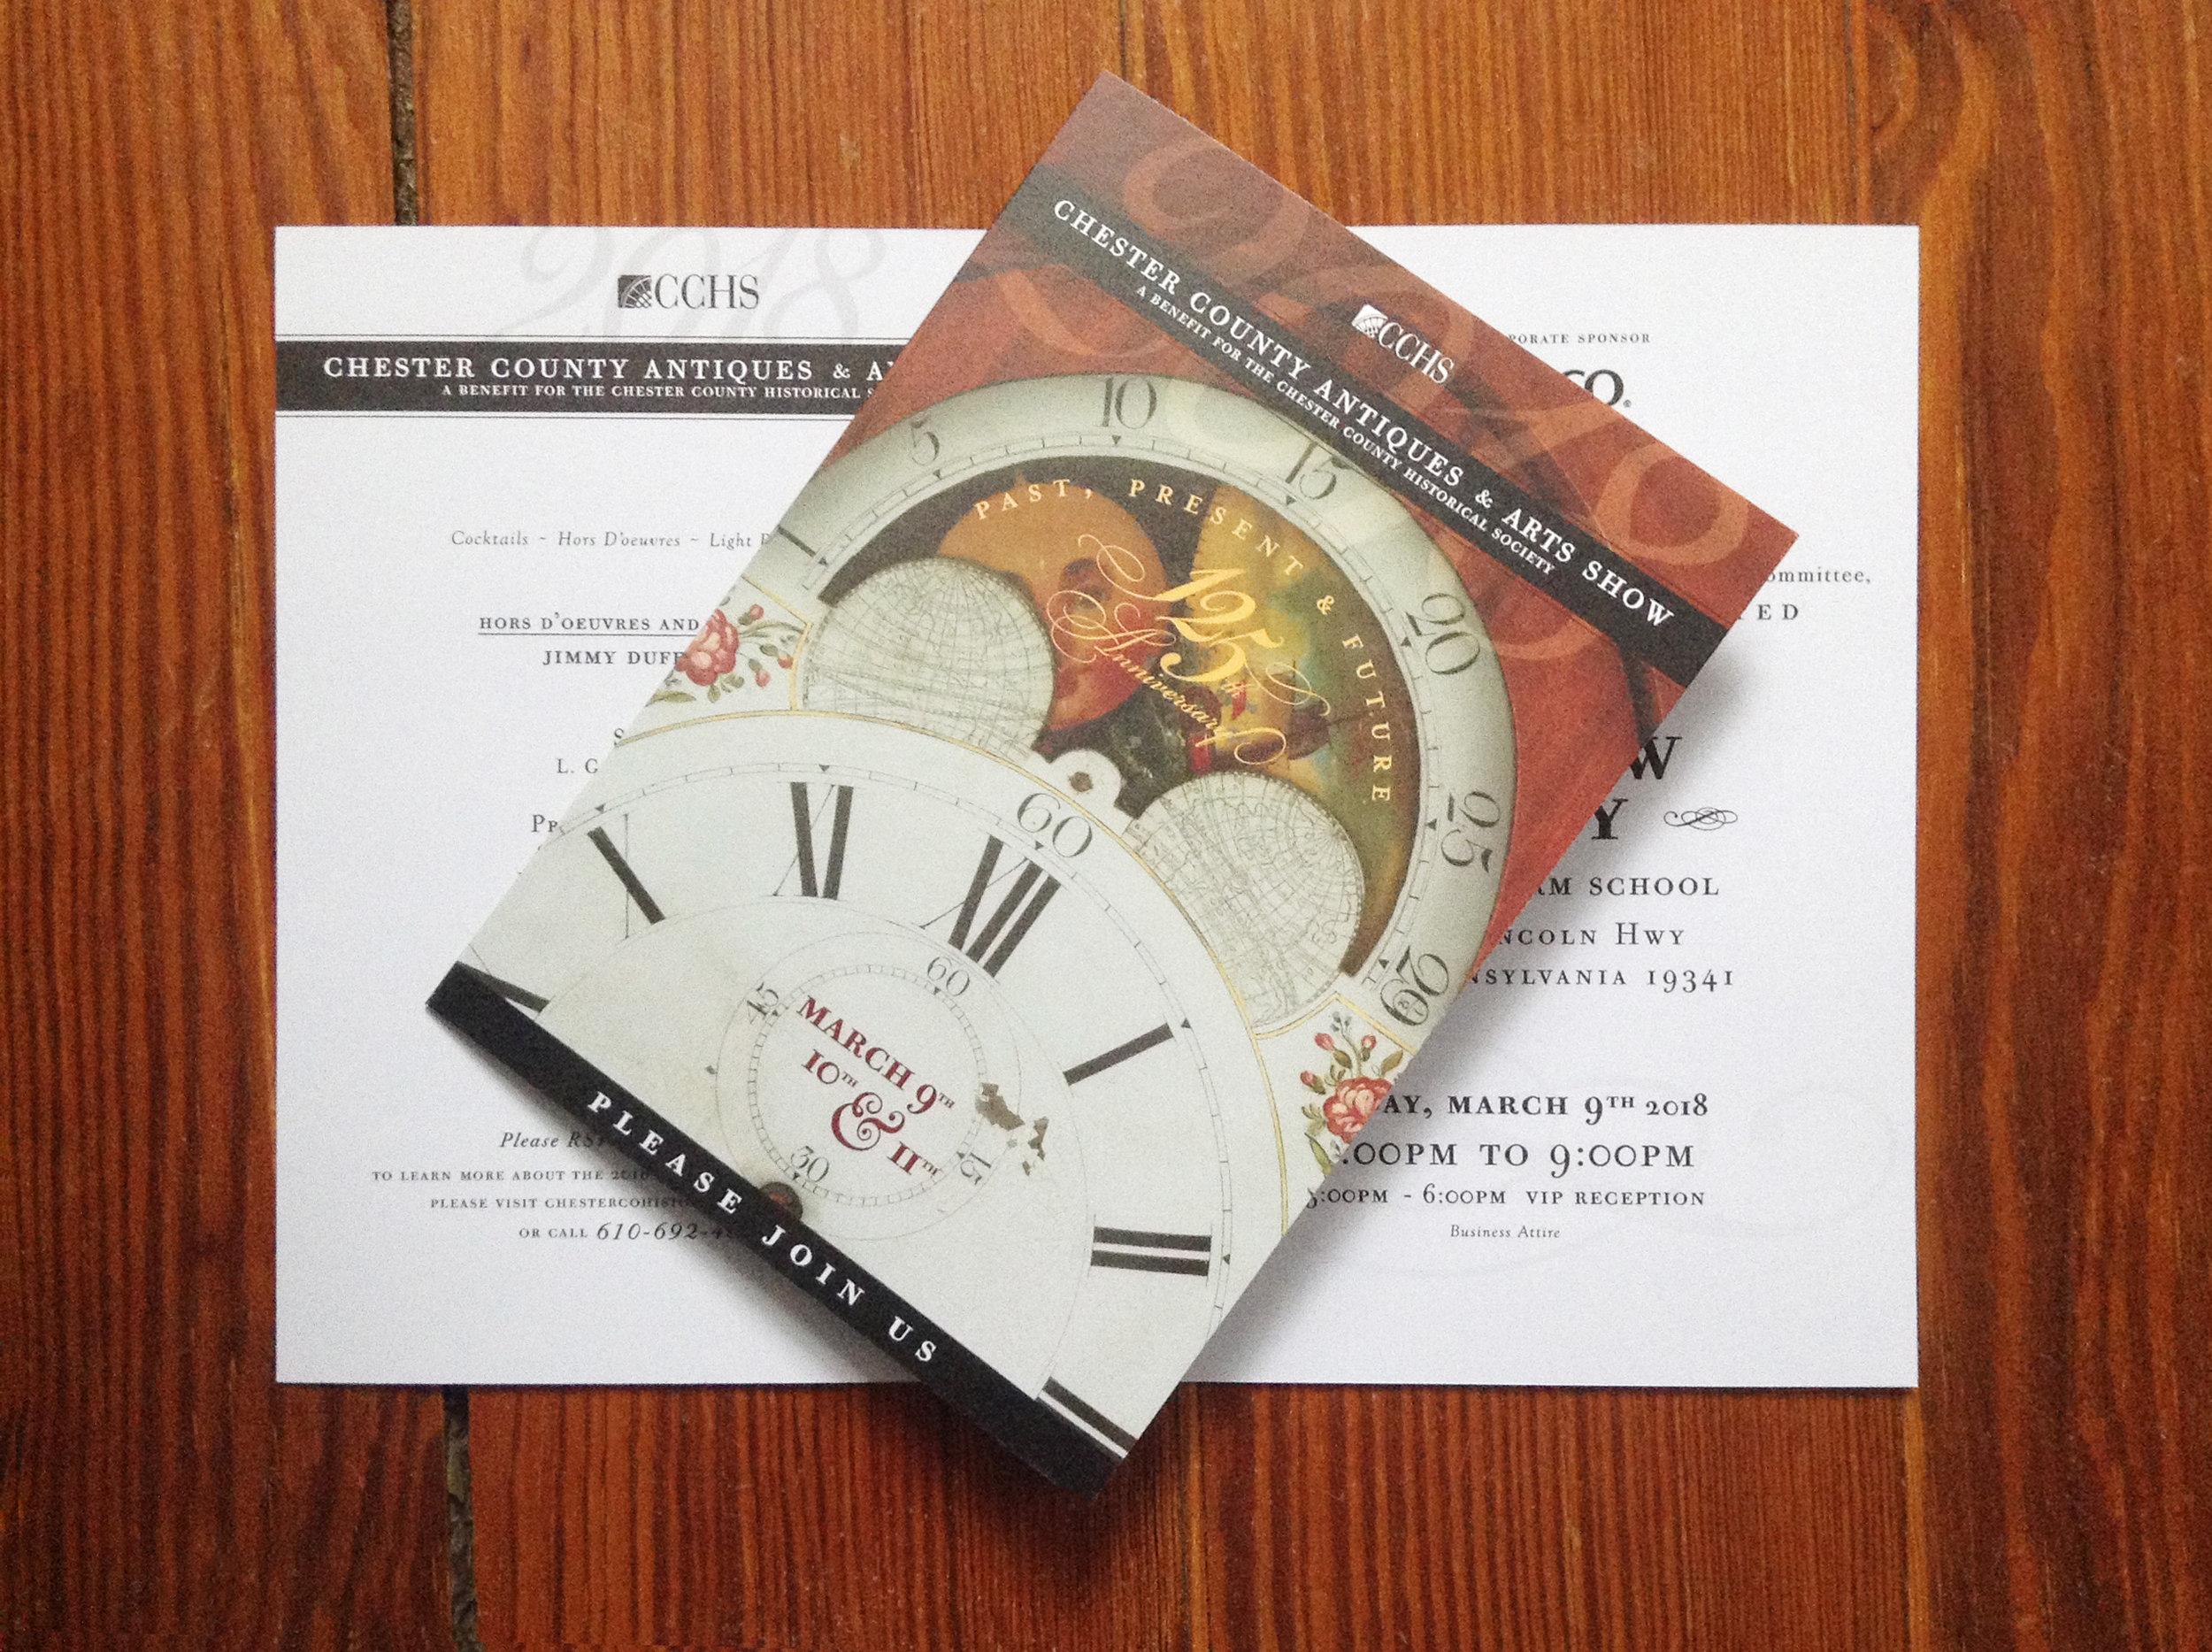 CCHS-Time-invite.jpg